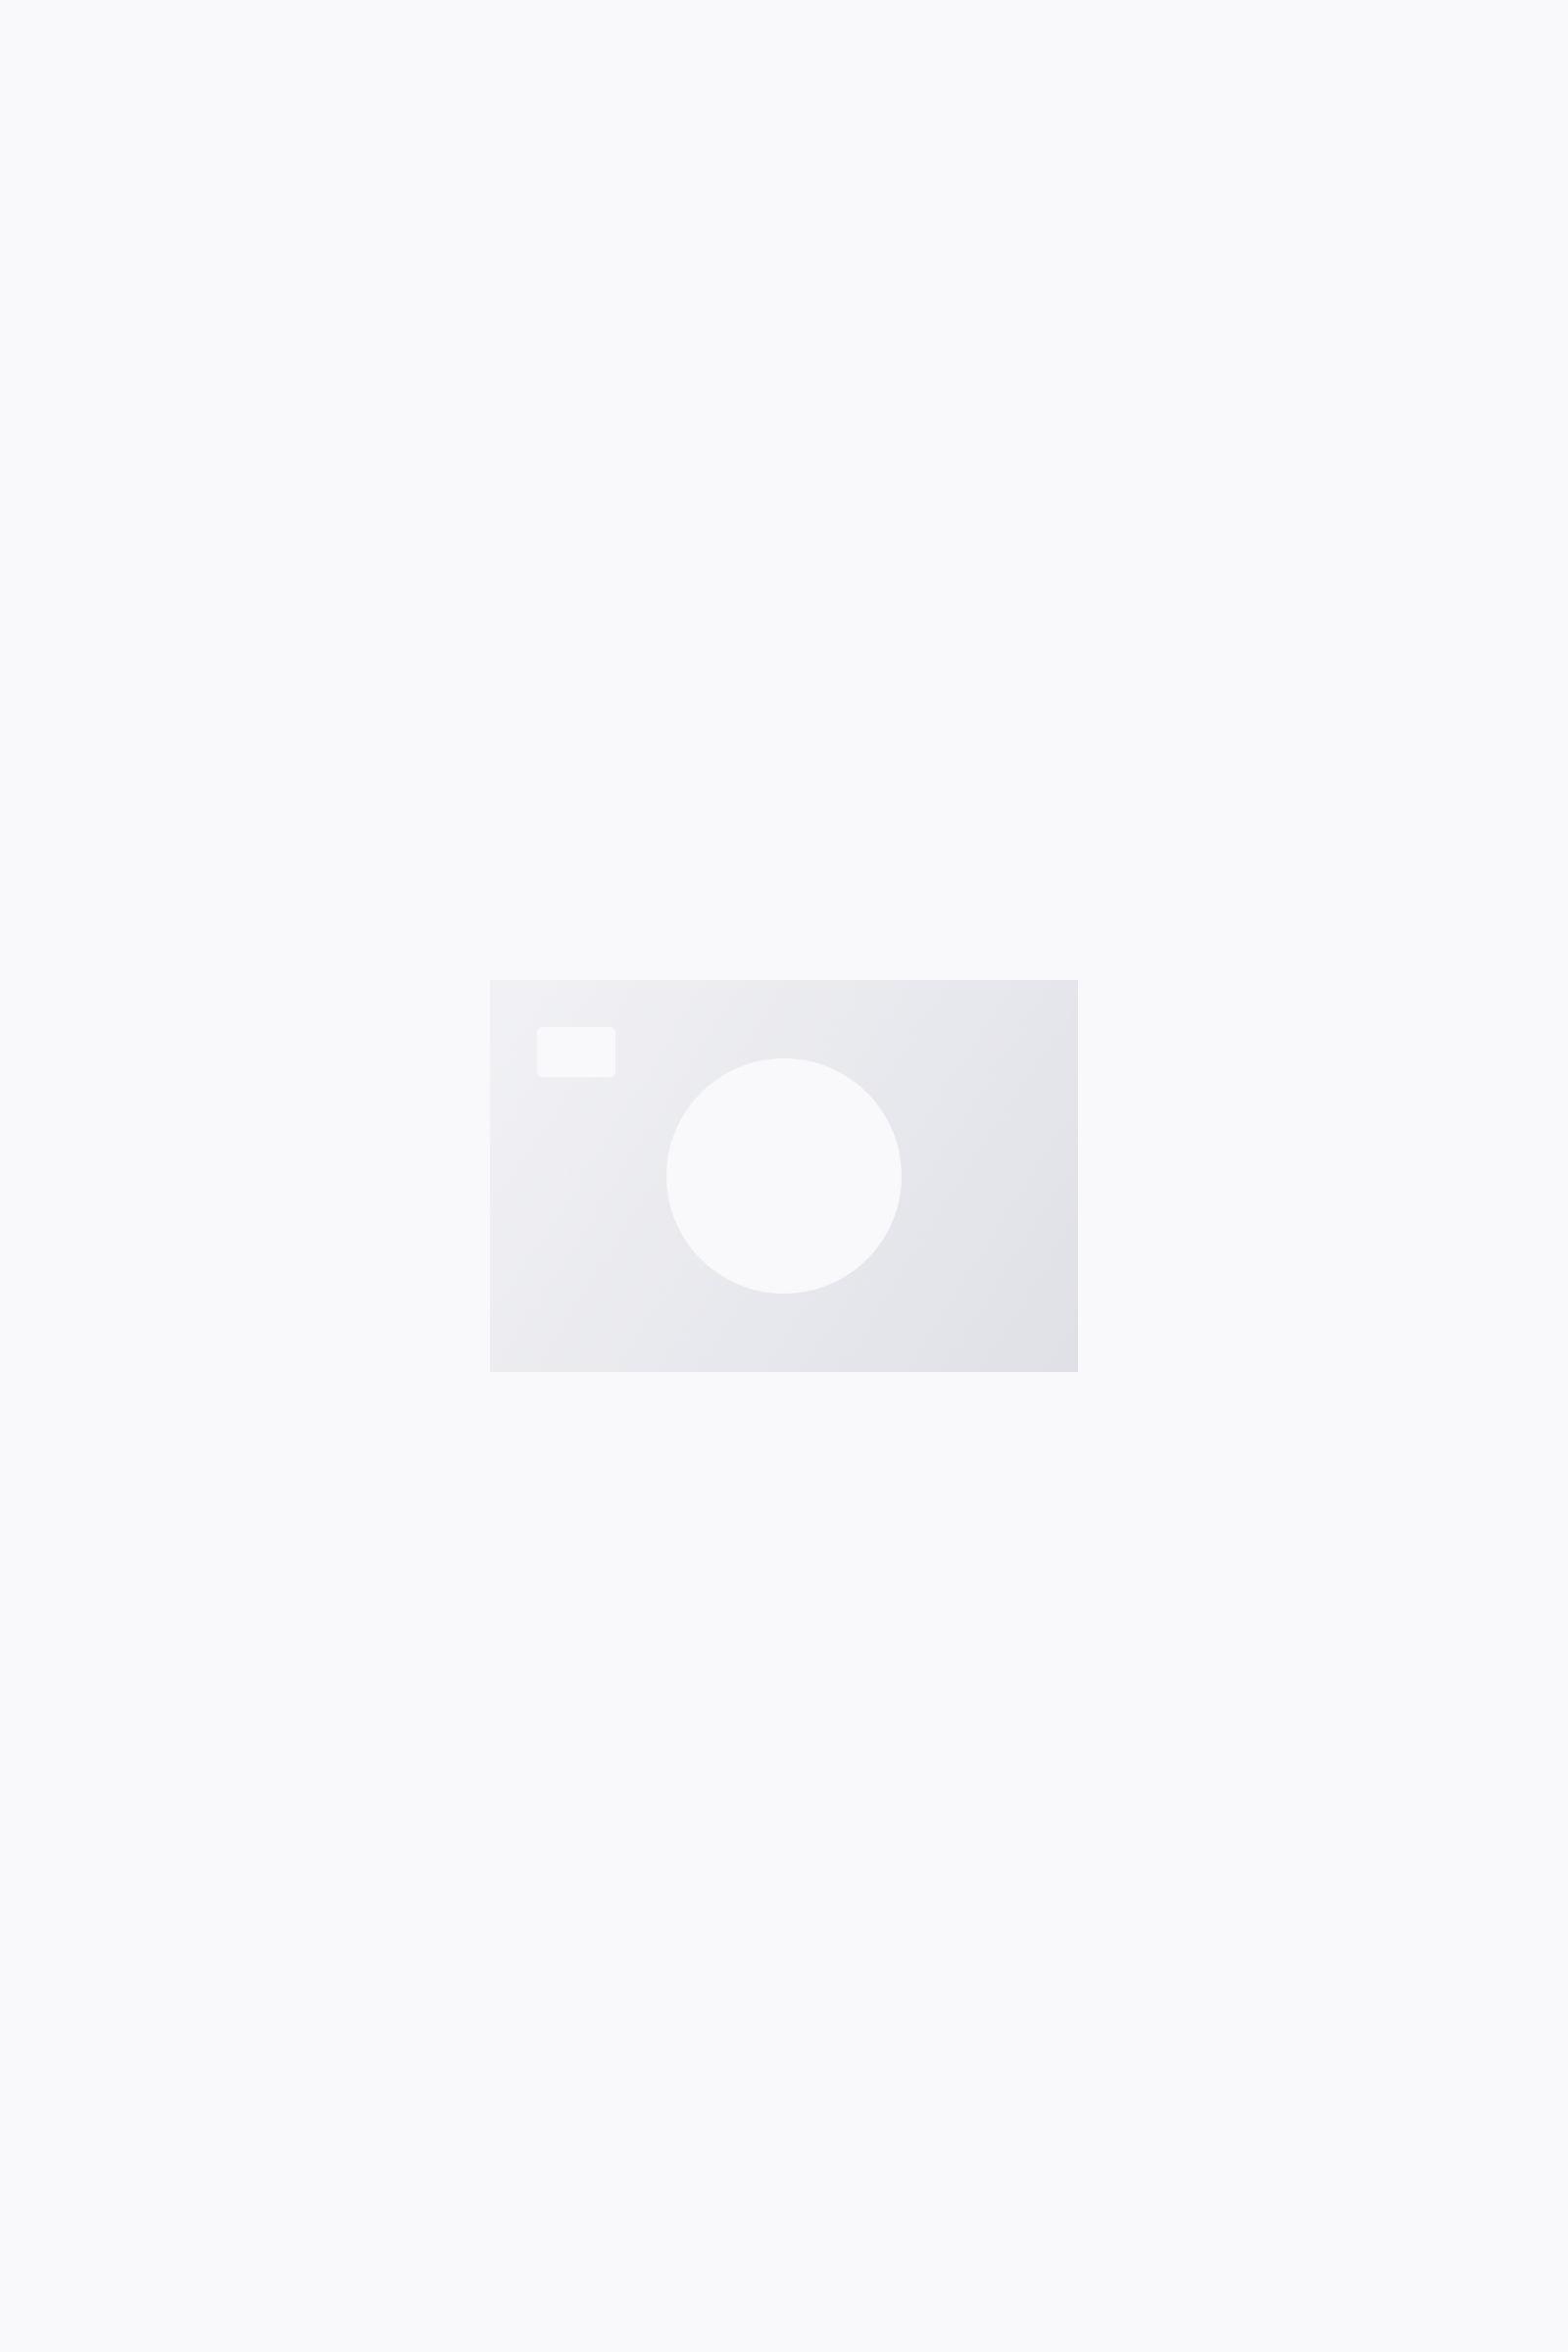 COS ROUND-NECK T-SHIRT,White